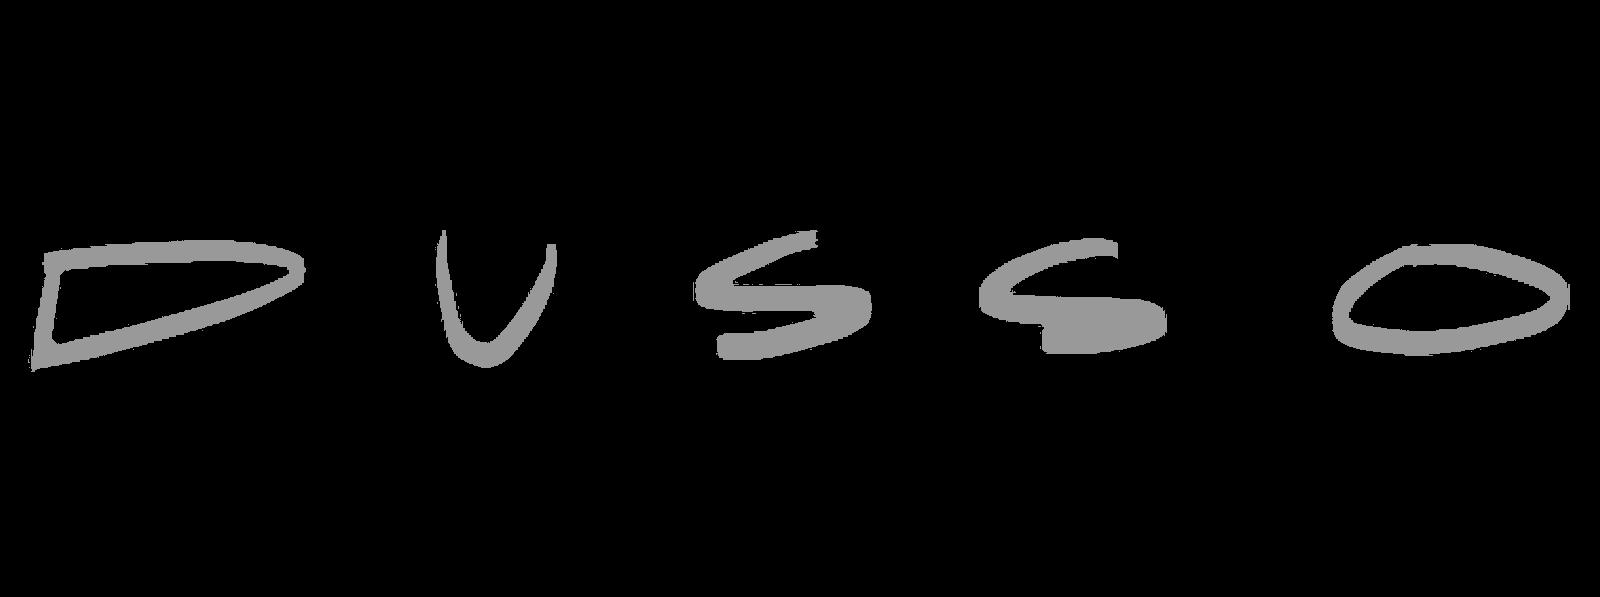 Dusso